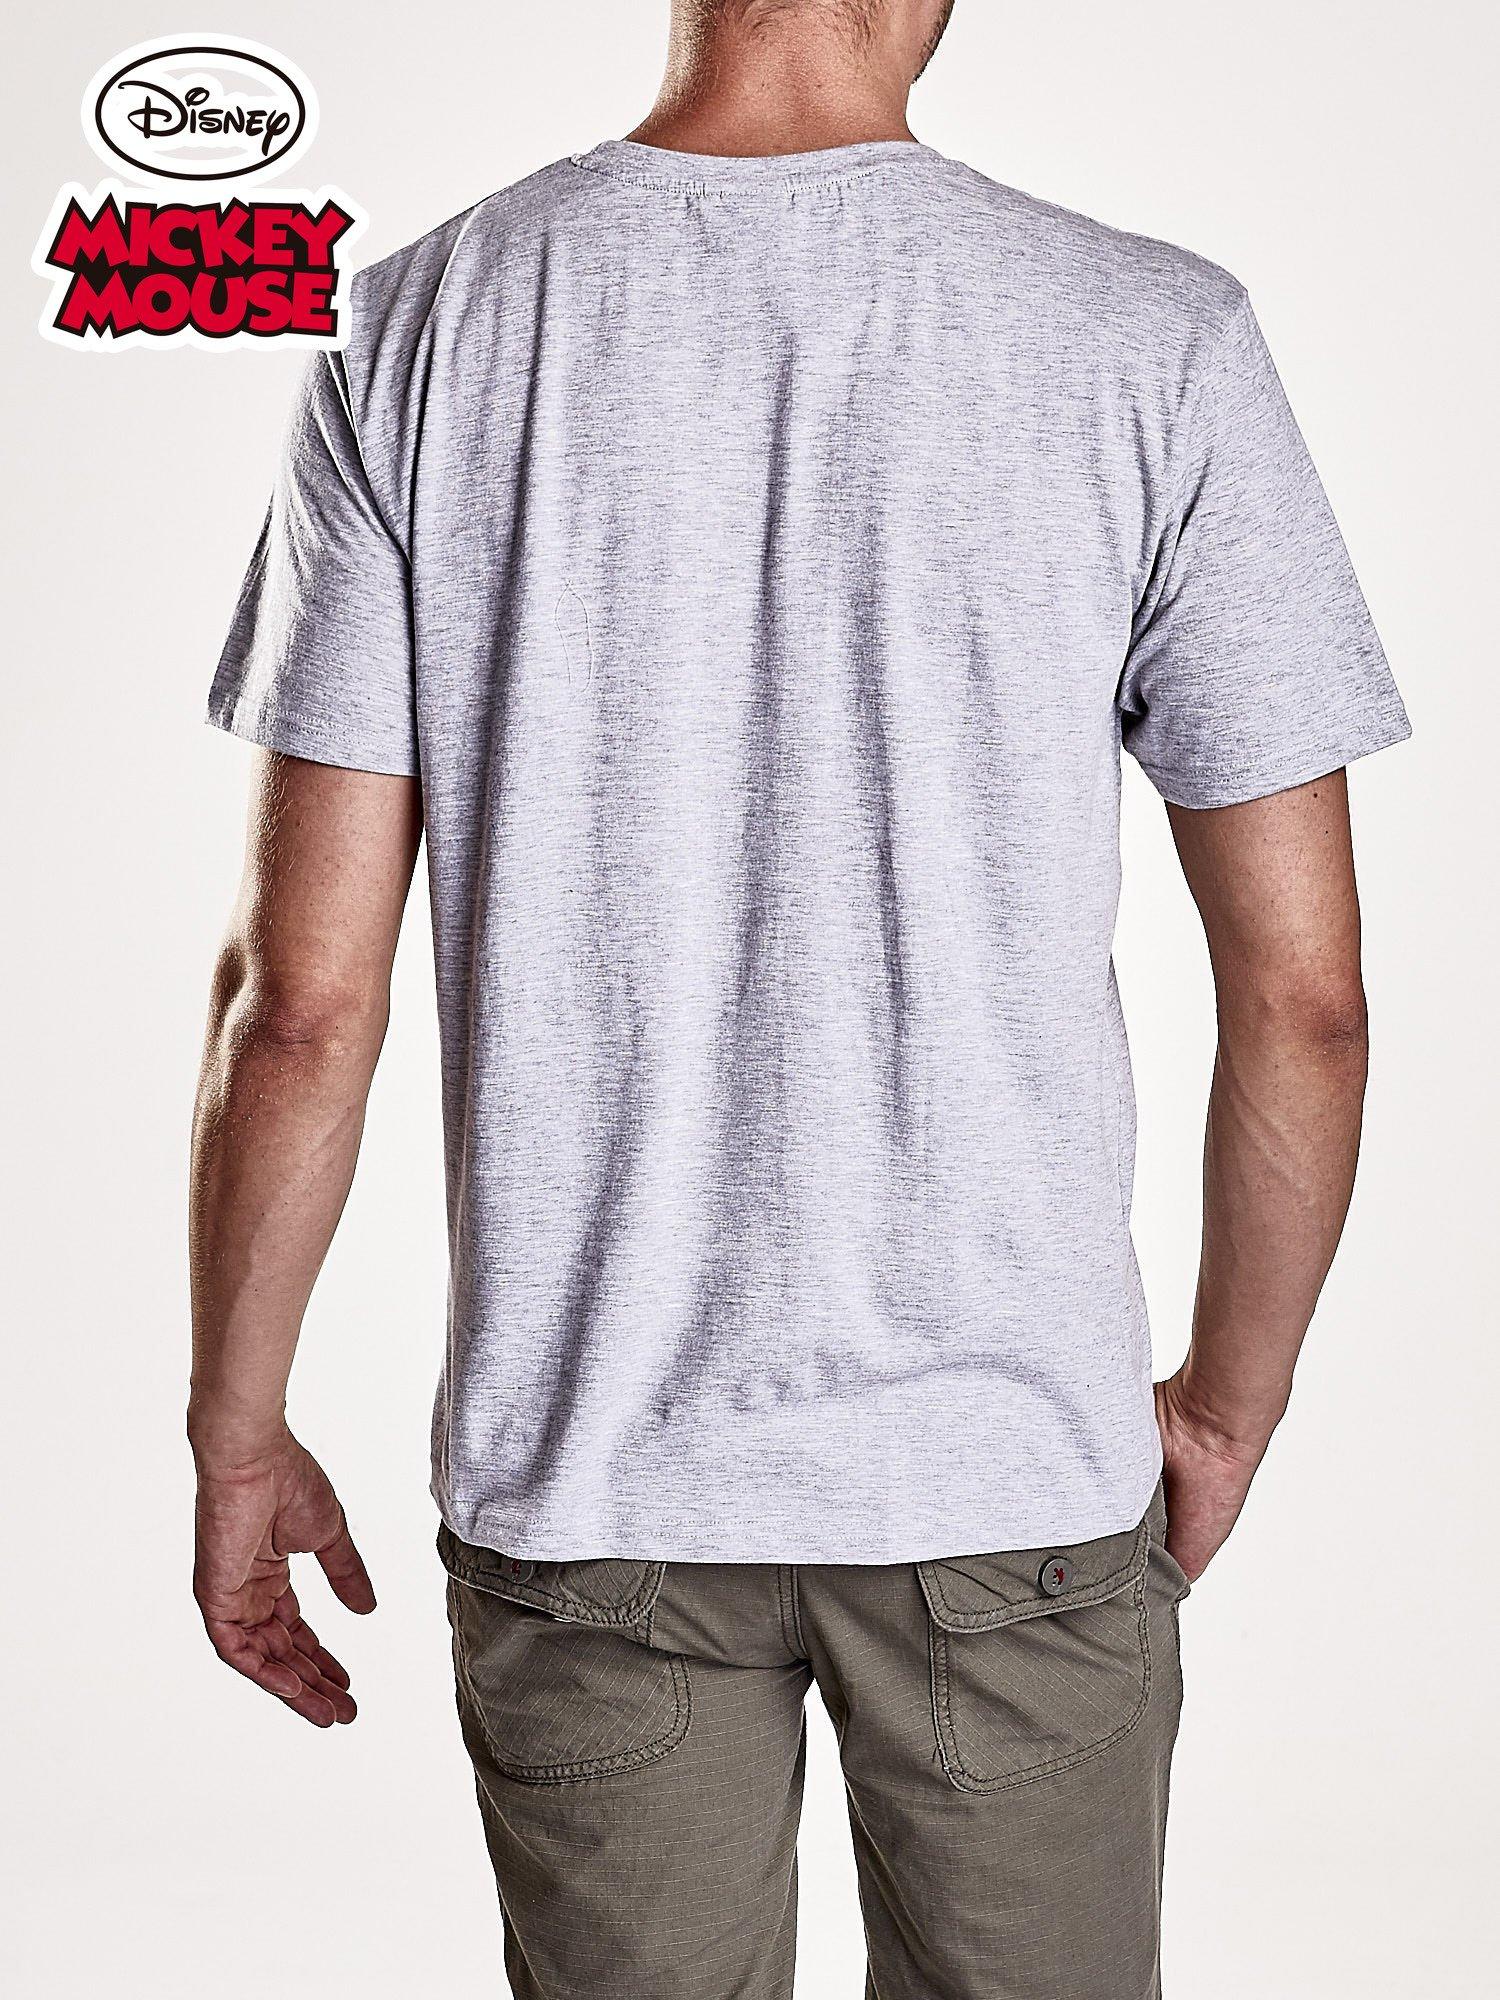 Szary t-shirt męski MICKEY MOUSE                                   zdj.                                  2